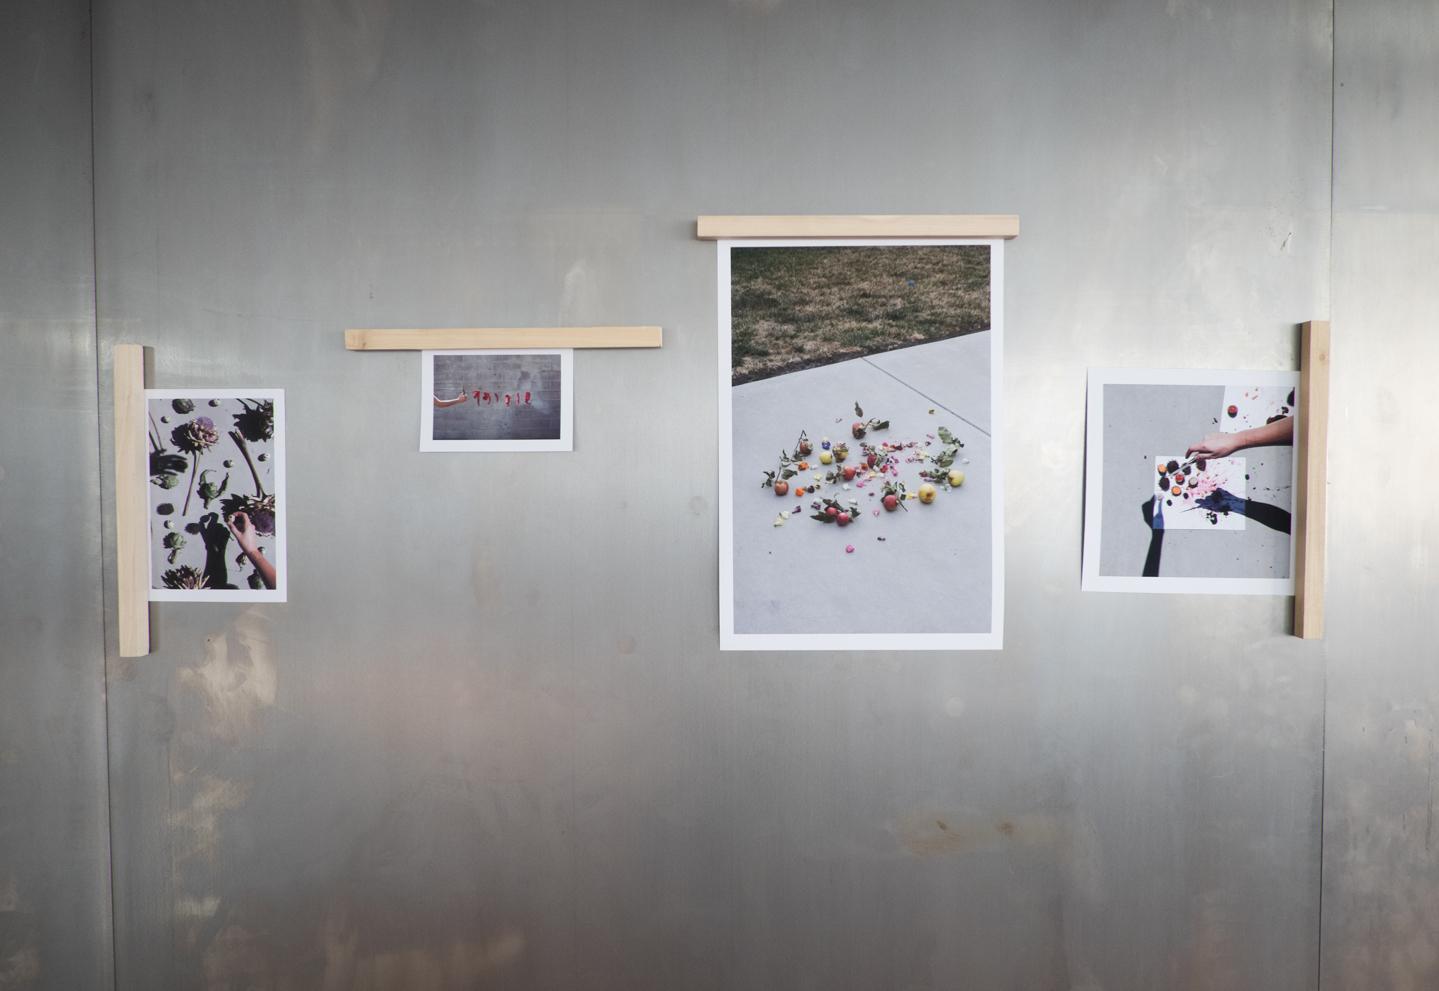 Photo series by Dana